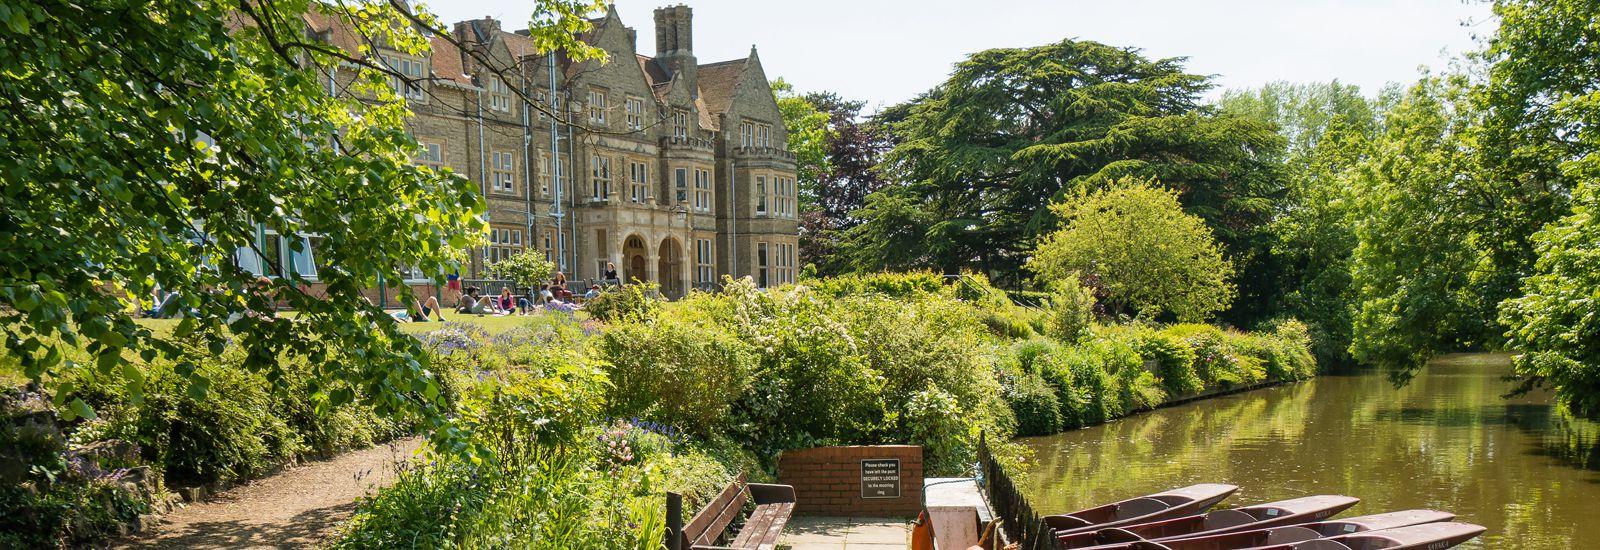 St. Hilda's College offers